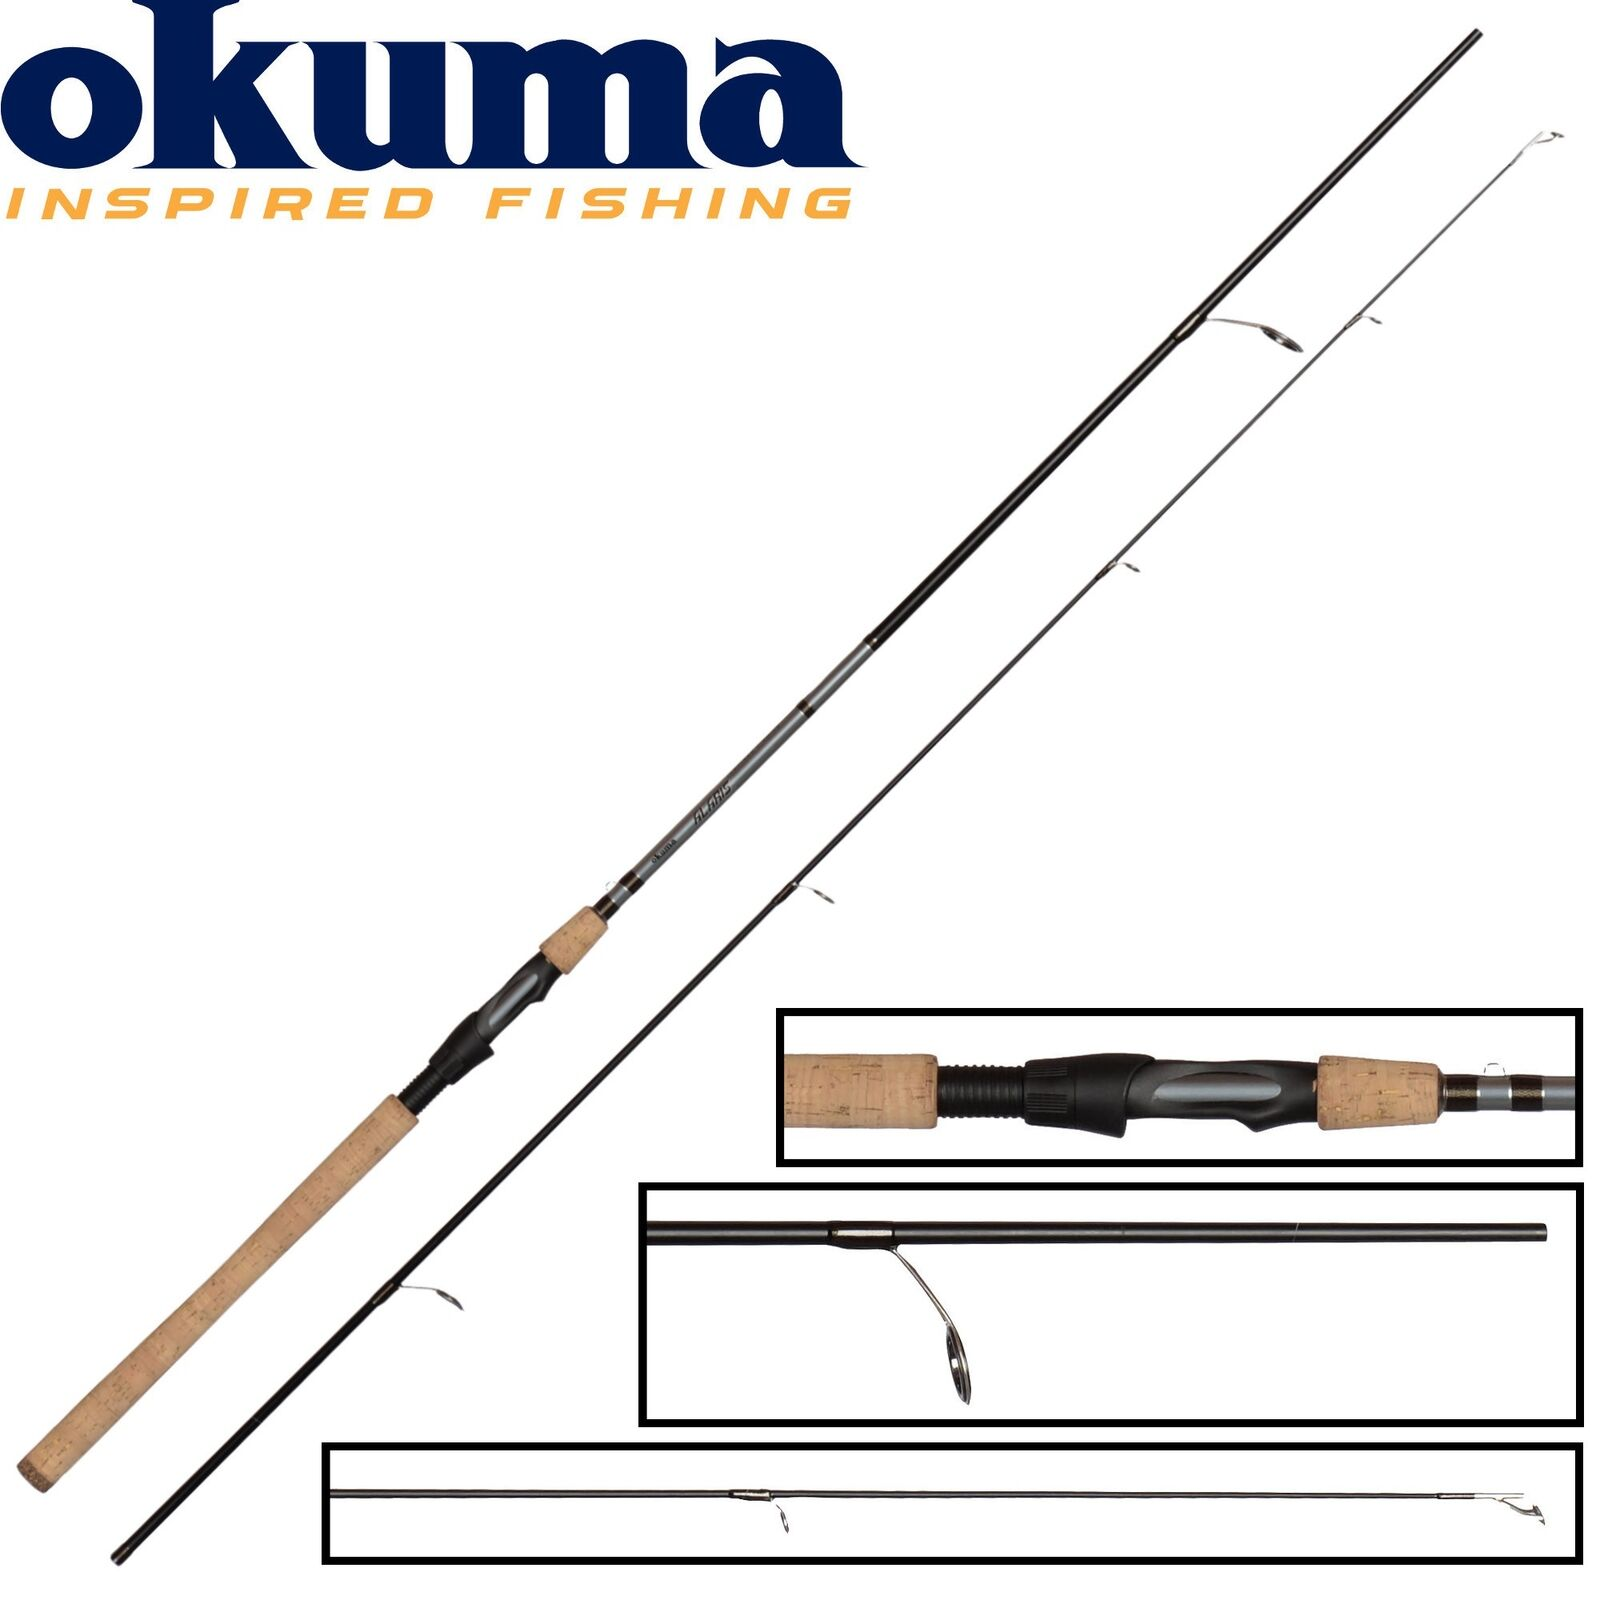 Okuma Alaris Spin FC FC FC 302cm 15-45g - Spinnrute zum Meerforellenangeln 78878c